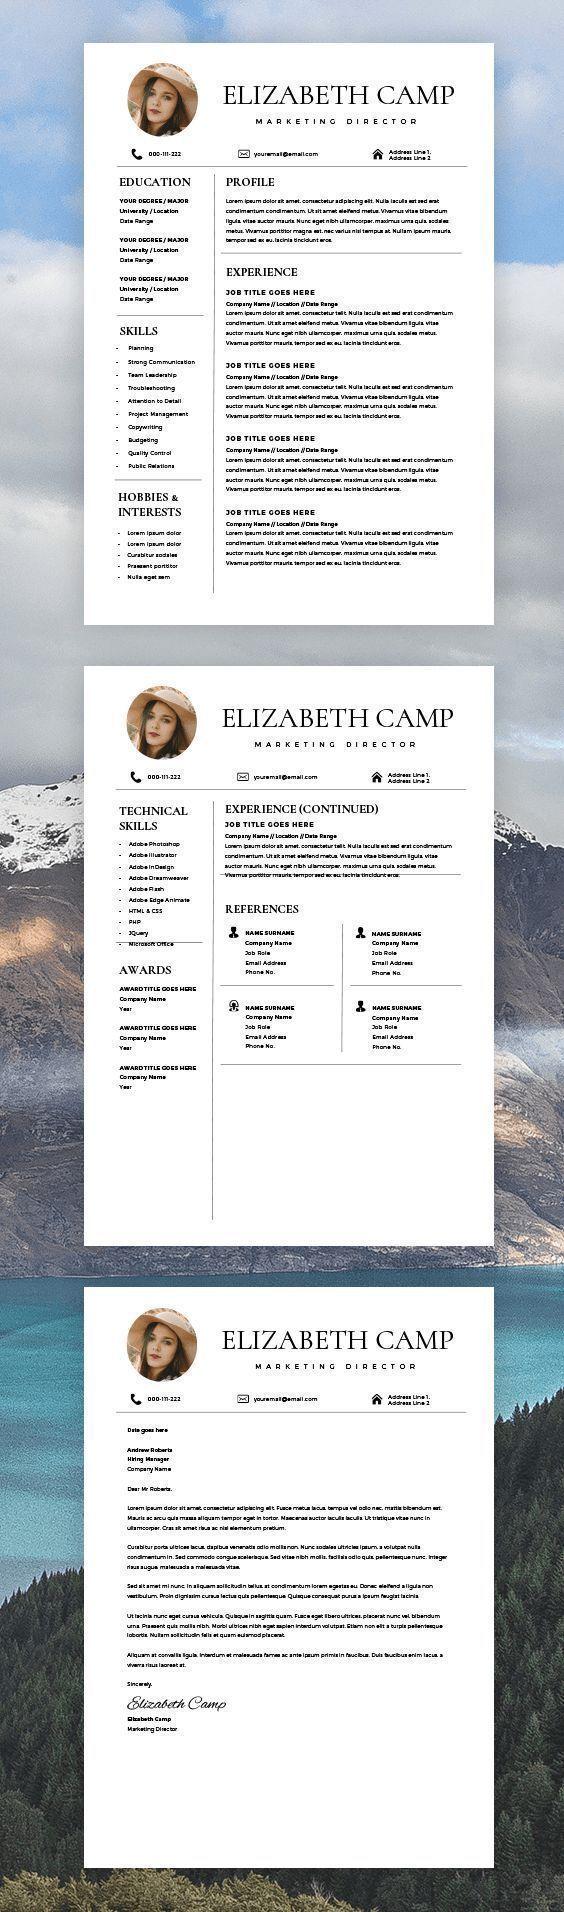 Best Modern Resume Templates Images On   Best Cv